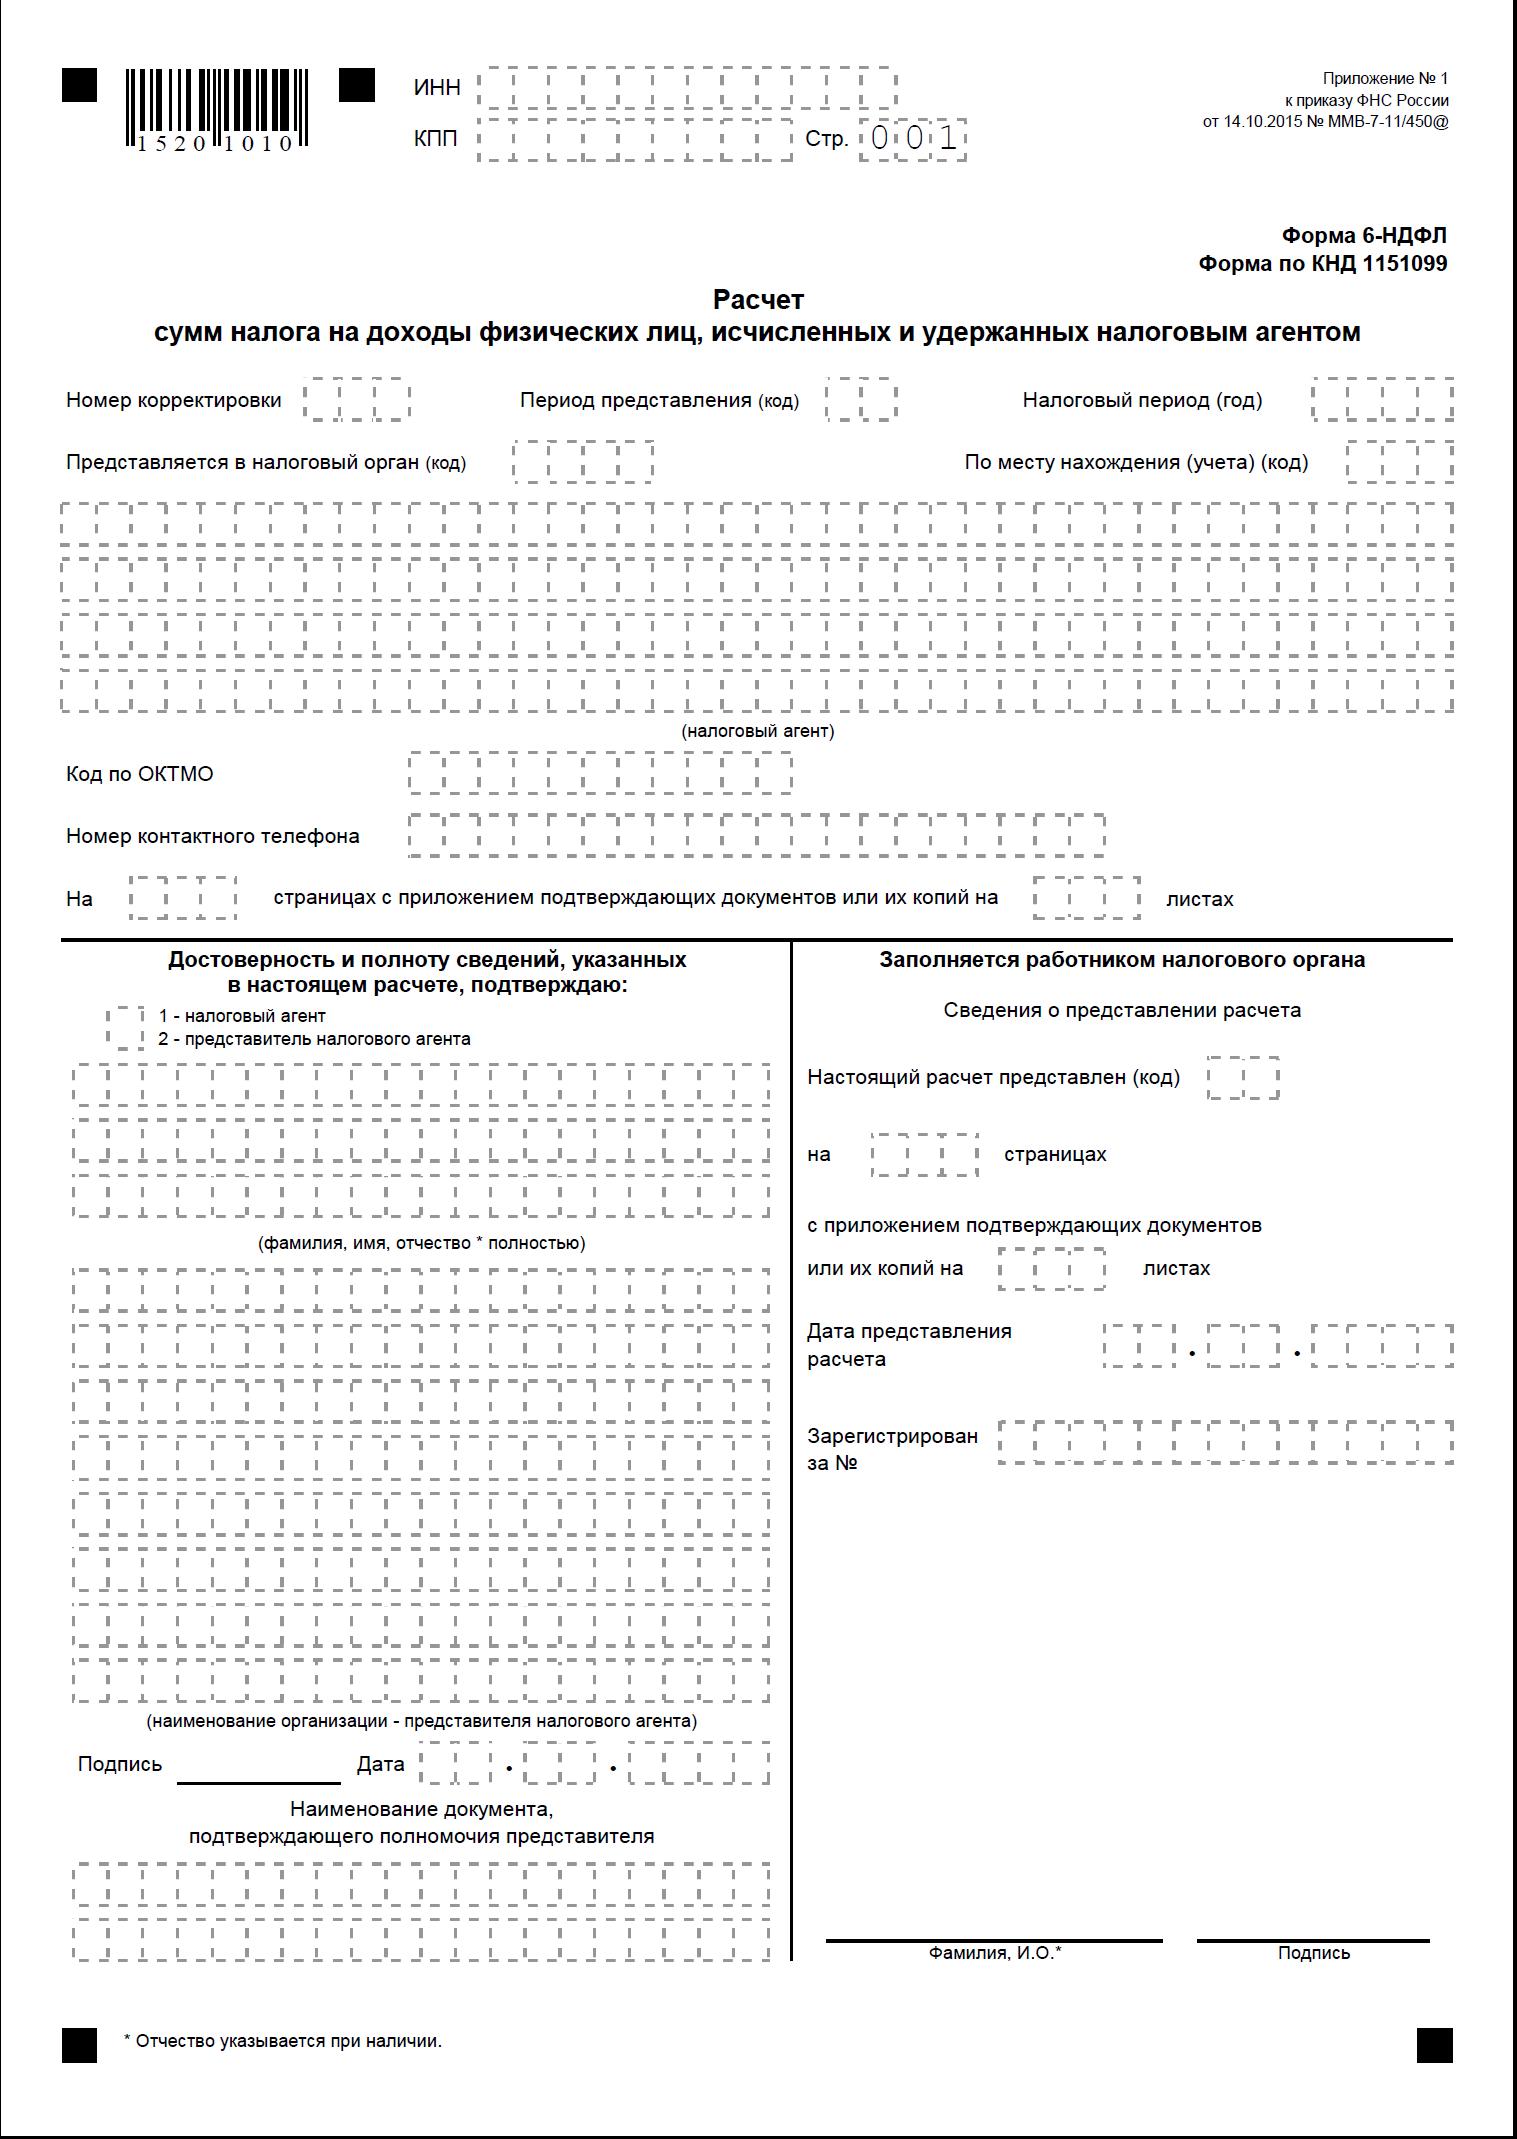 бланк форма отчетности n 1-м, 2-м на 2013 год